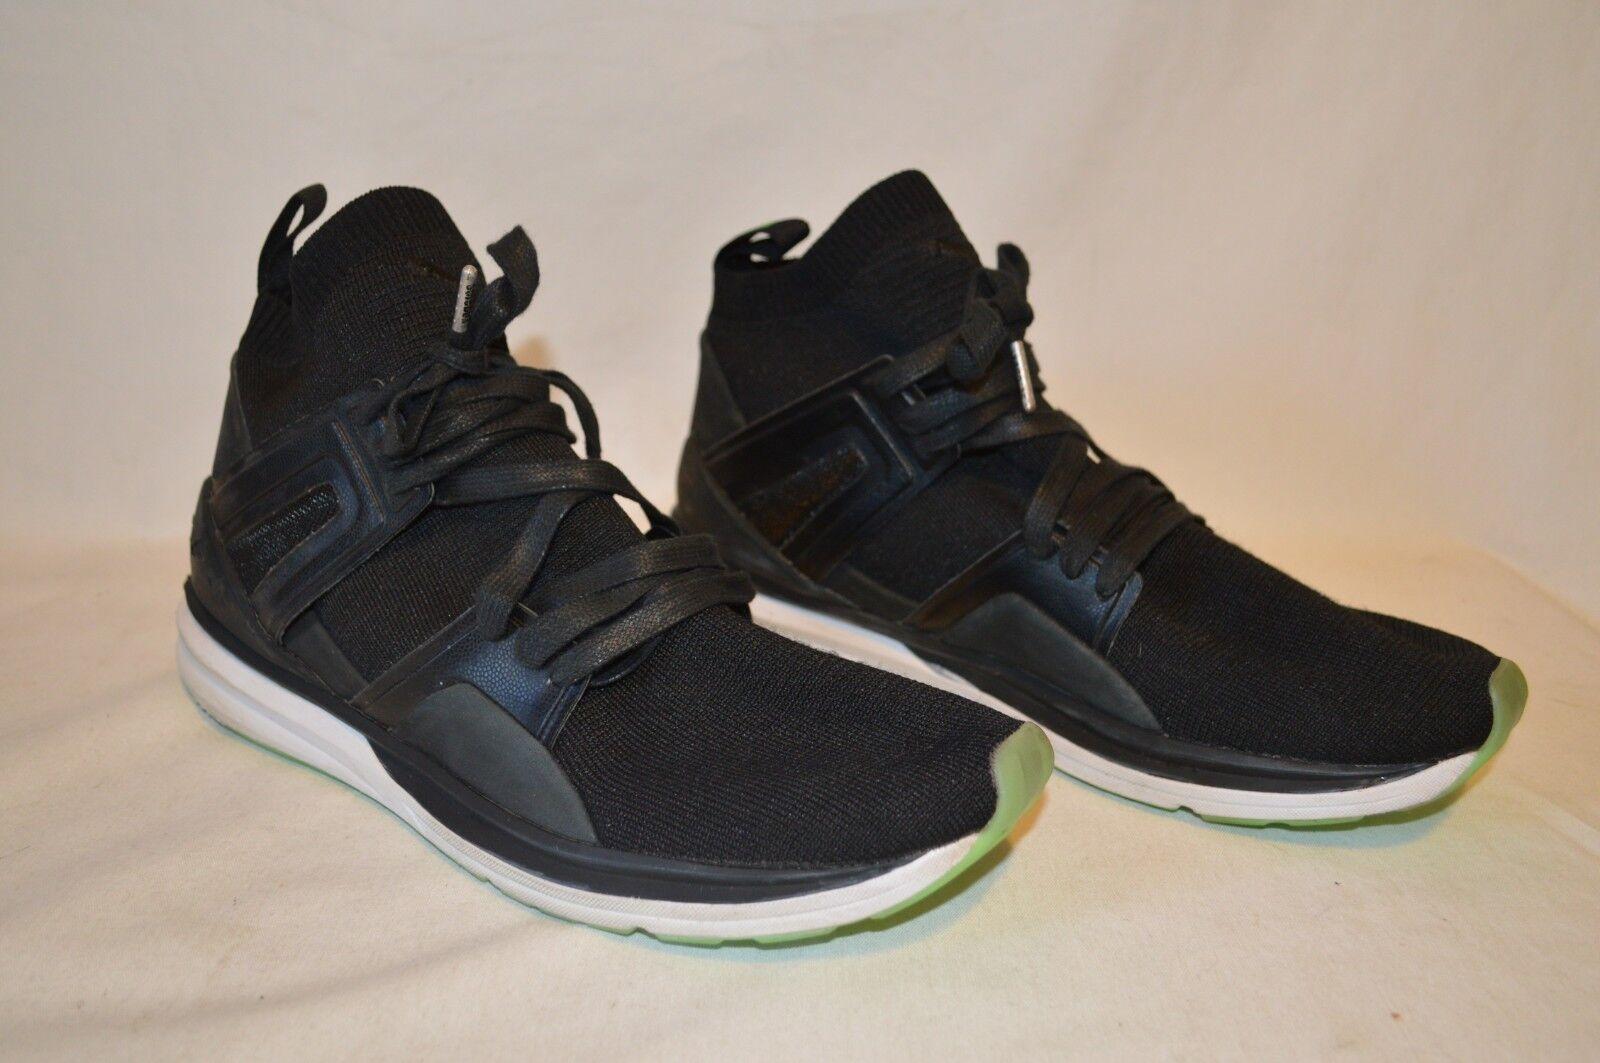 Puma Blaze Of Glory Limitless Solebox Hi Tops Black Sneakers Size 10